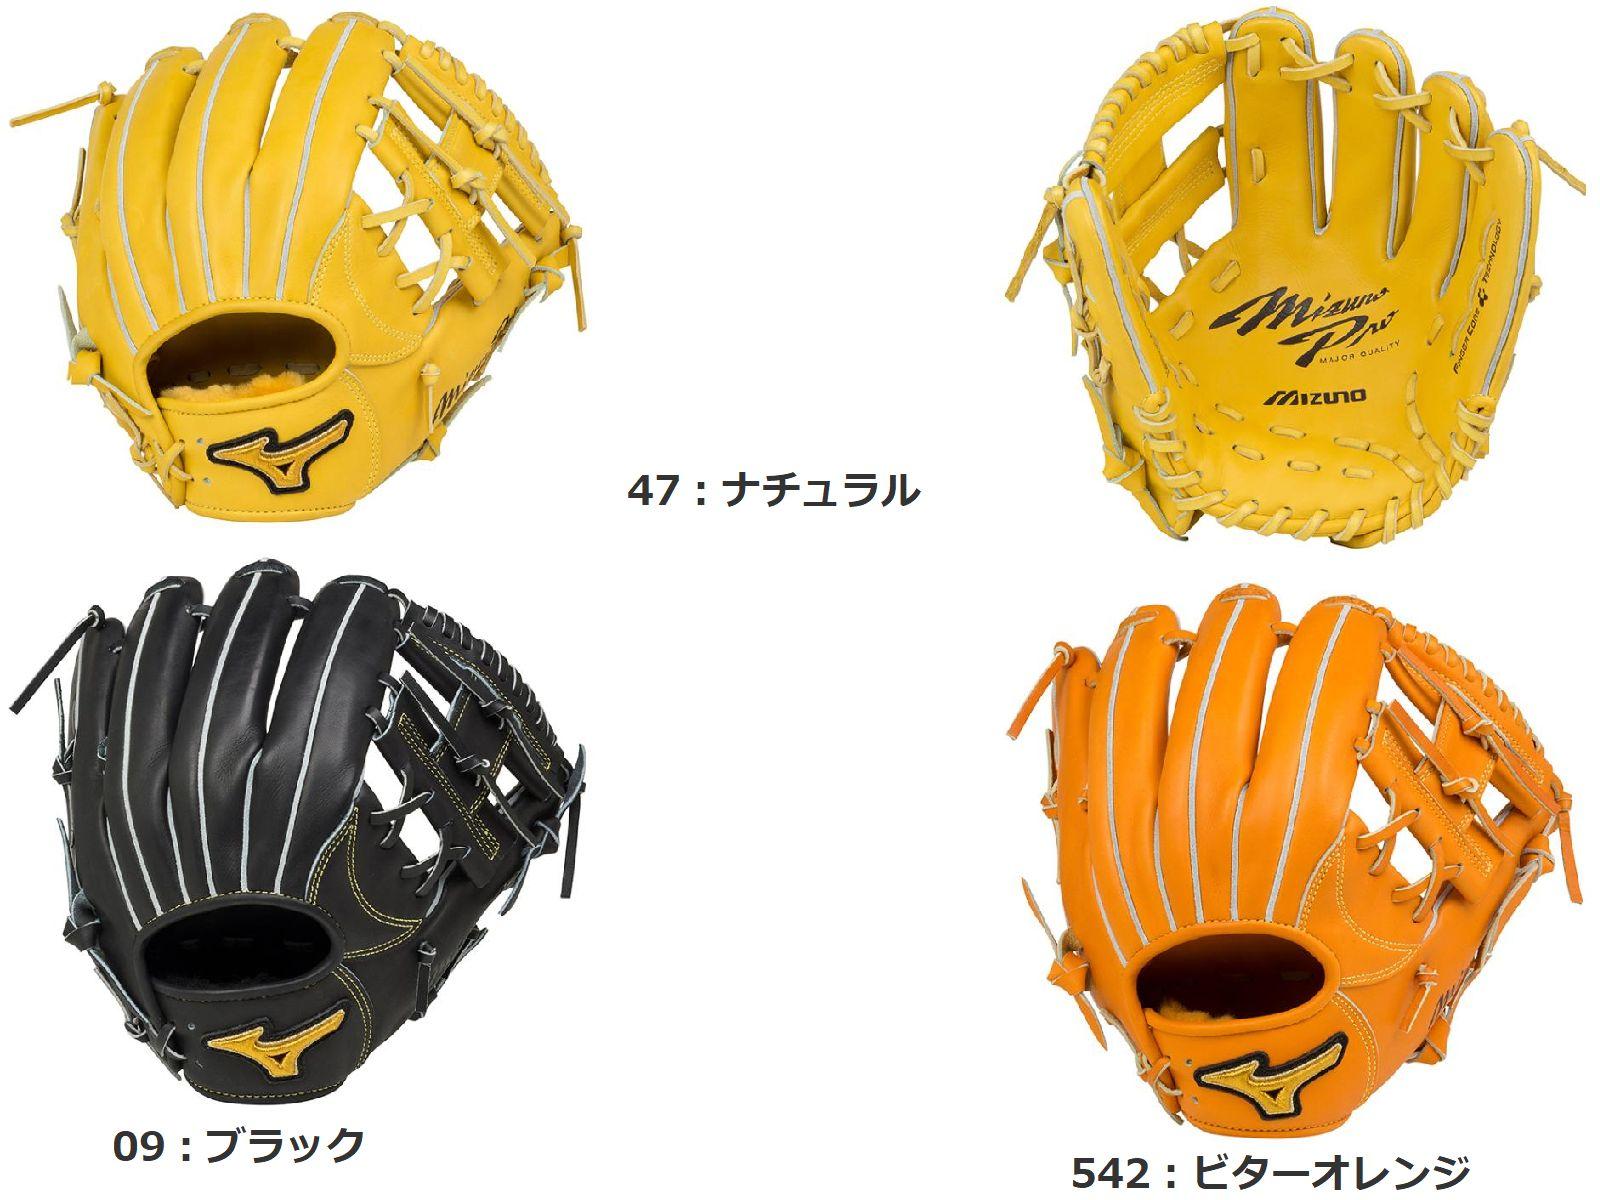 【Mizuno PRO=ミズノプロ】野球 硬式用 グラブ グローブ<フィンガーコアテクノロジー【内野手用4 4/6(二塁手・遊撃手向)】[タイト設計タイプ]【ジェネラルキップレザー】>[ポケット正面タイプ](サイズ:8)<3色展開>(右投用)